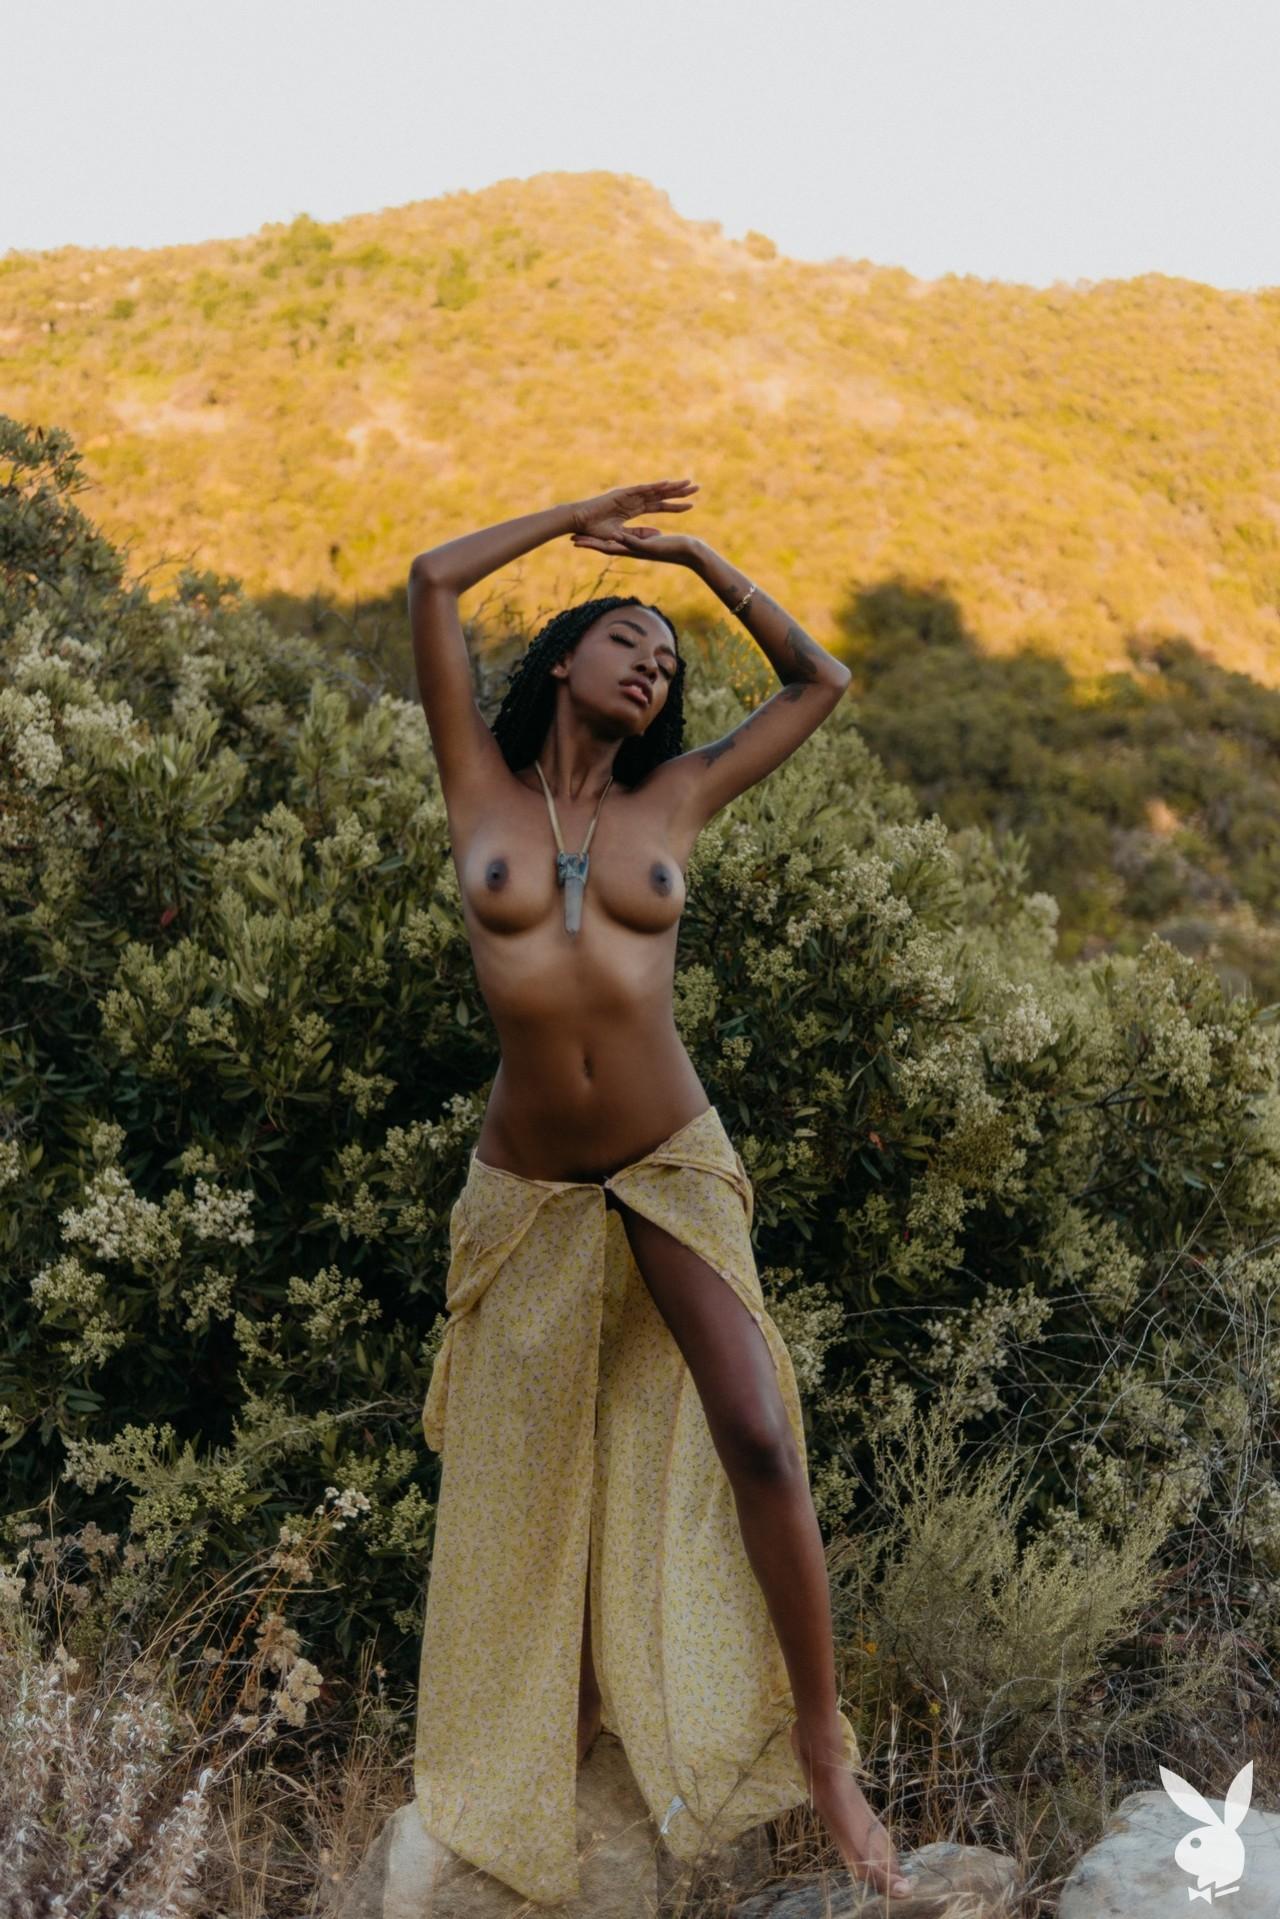 Sarissle - Playboy photoshoot